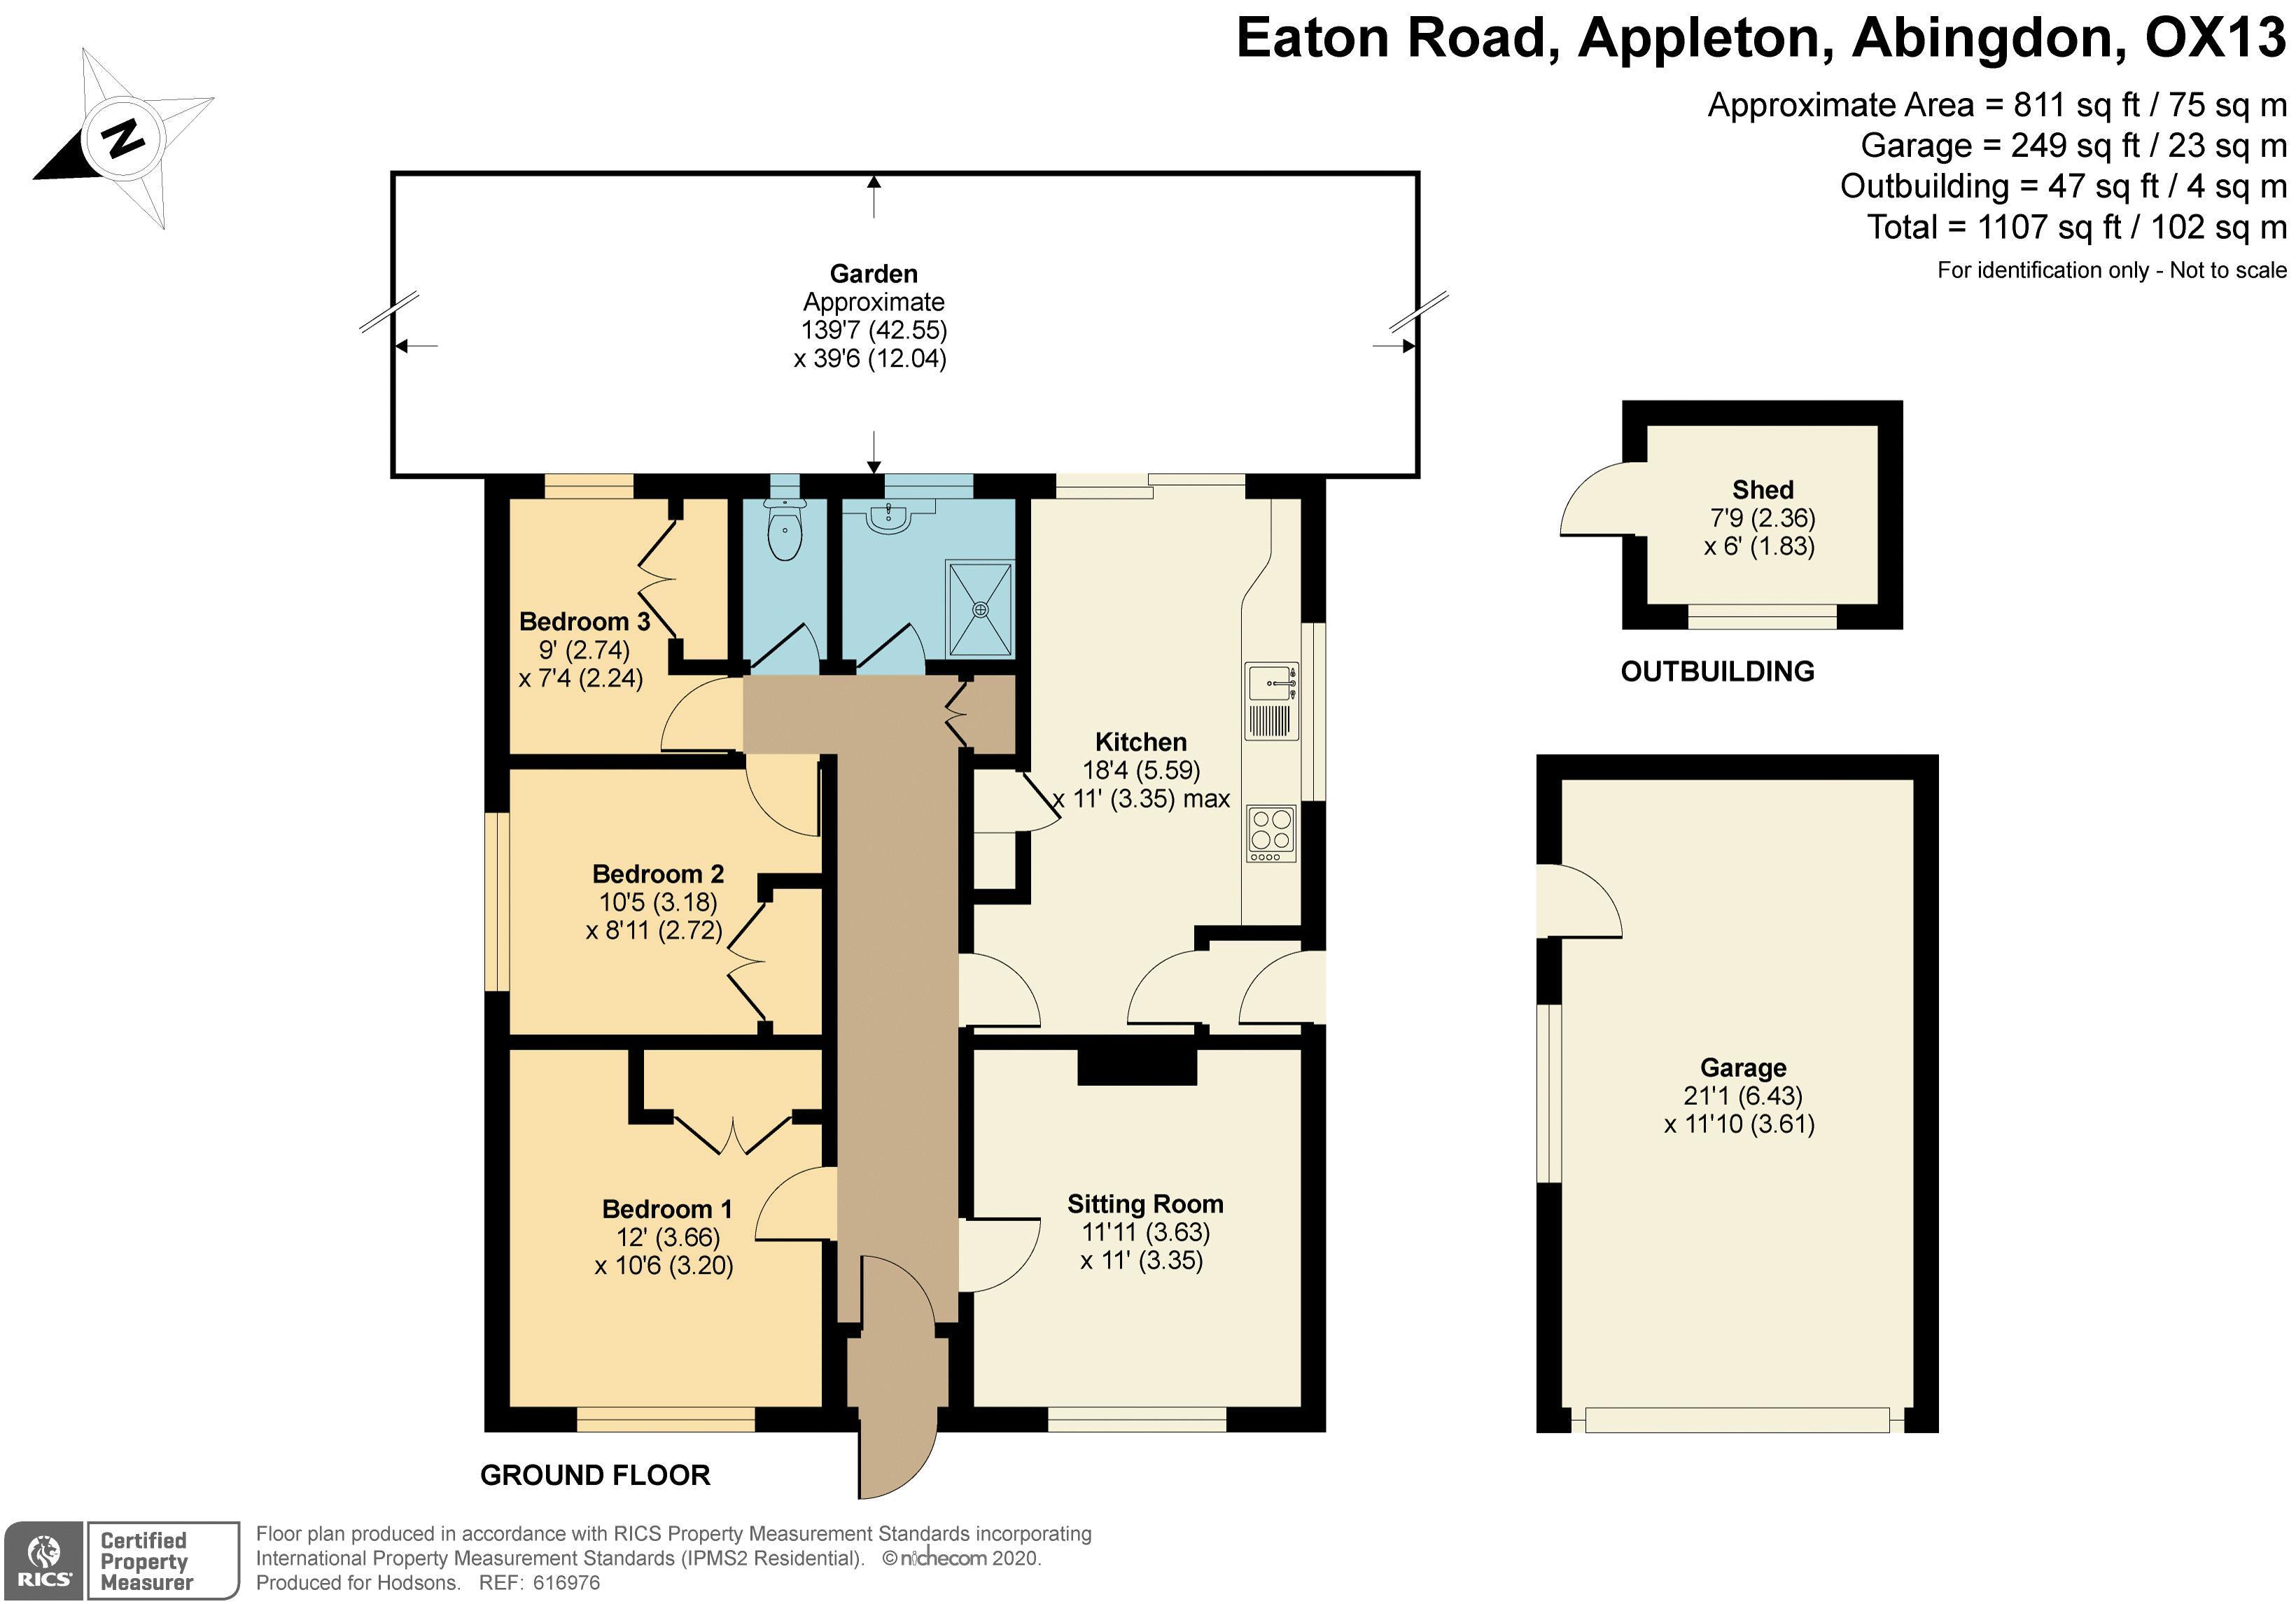 Eaton Road Appleton